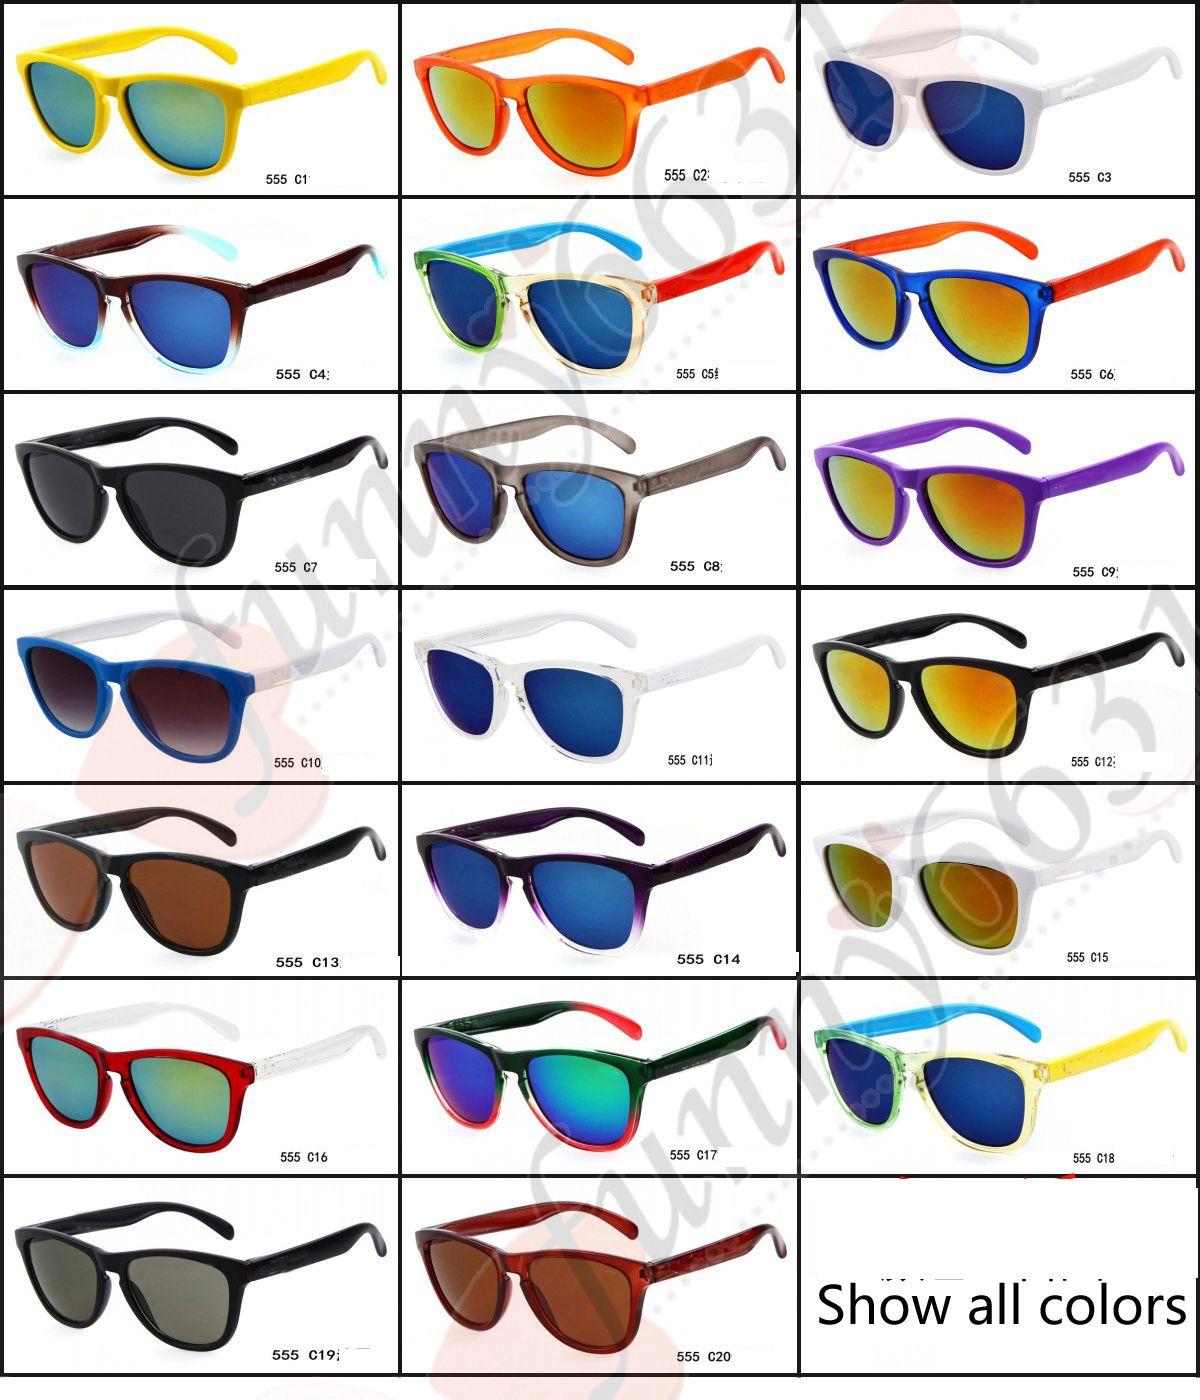 FREESHIP جديد 18 نماذج رجل نوعية جيدة أفضل بارد لطيف رياضة ركوب الدراجات نظارات دراجة دراجة نارية الرجال أزياء النظارات الشمسية كامل اللون